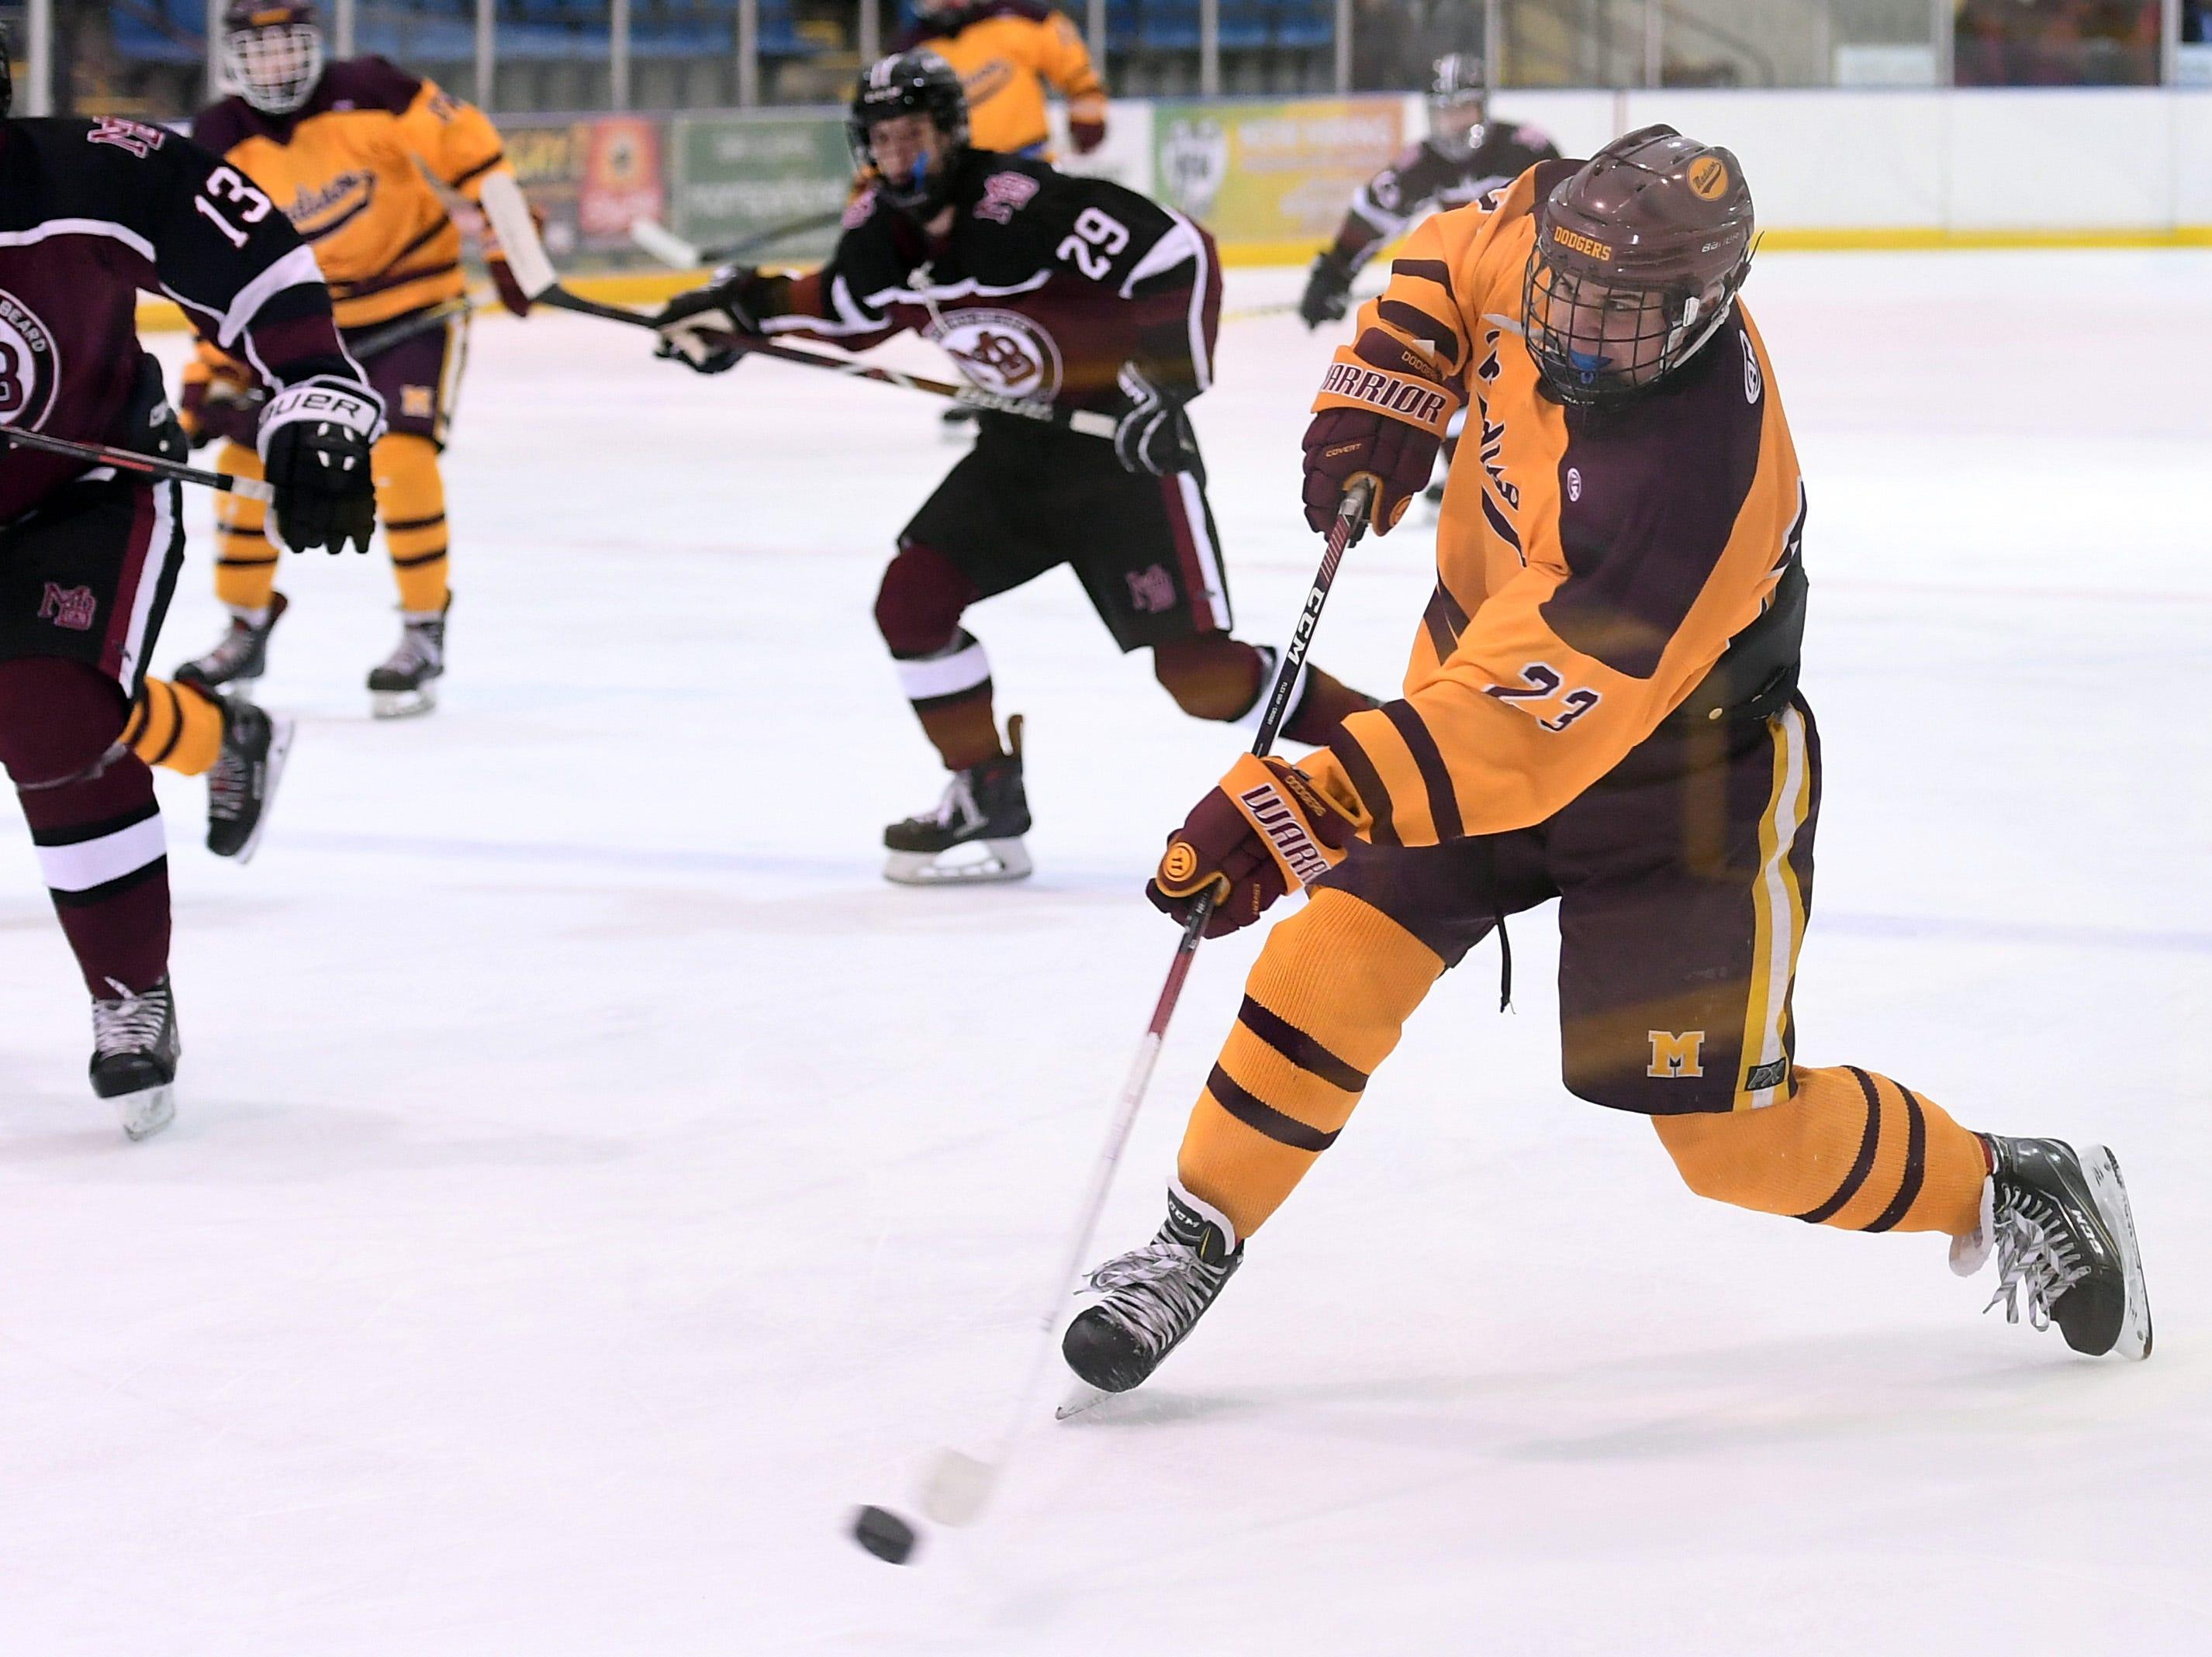 Madison ice hockey vs. Morristown-Beard at Mennen Sports Arena on Thursday, December 20, 2018. Madison #23 Jack Downs.